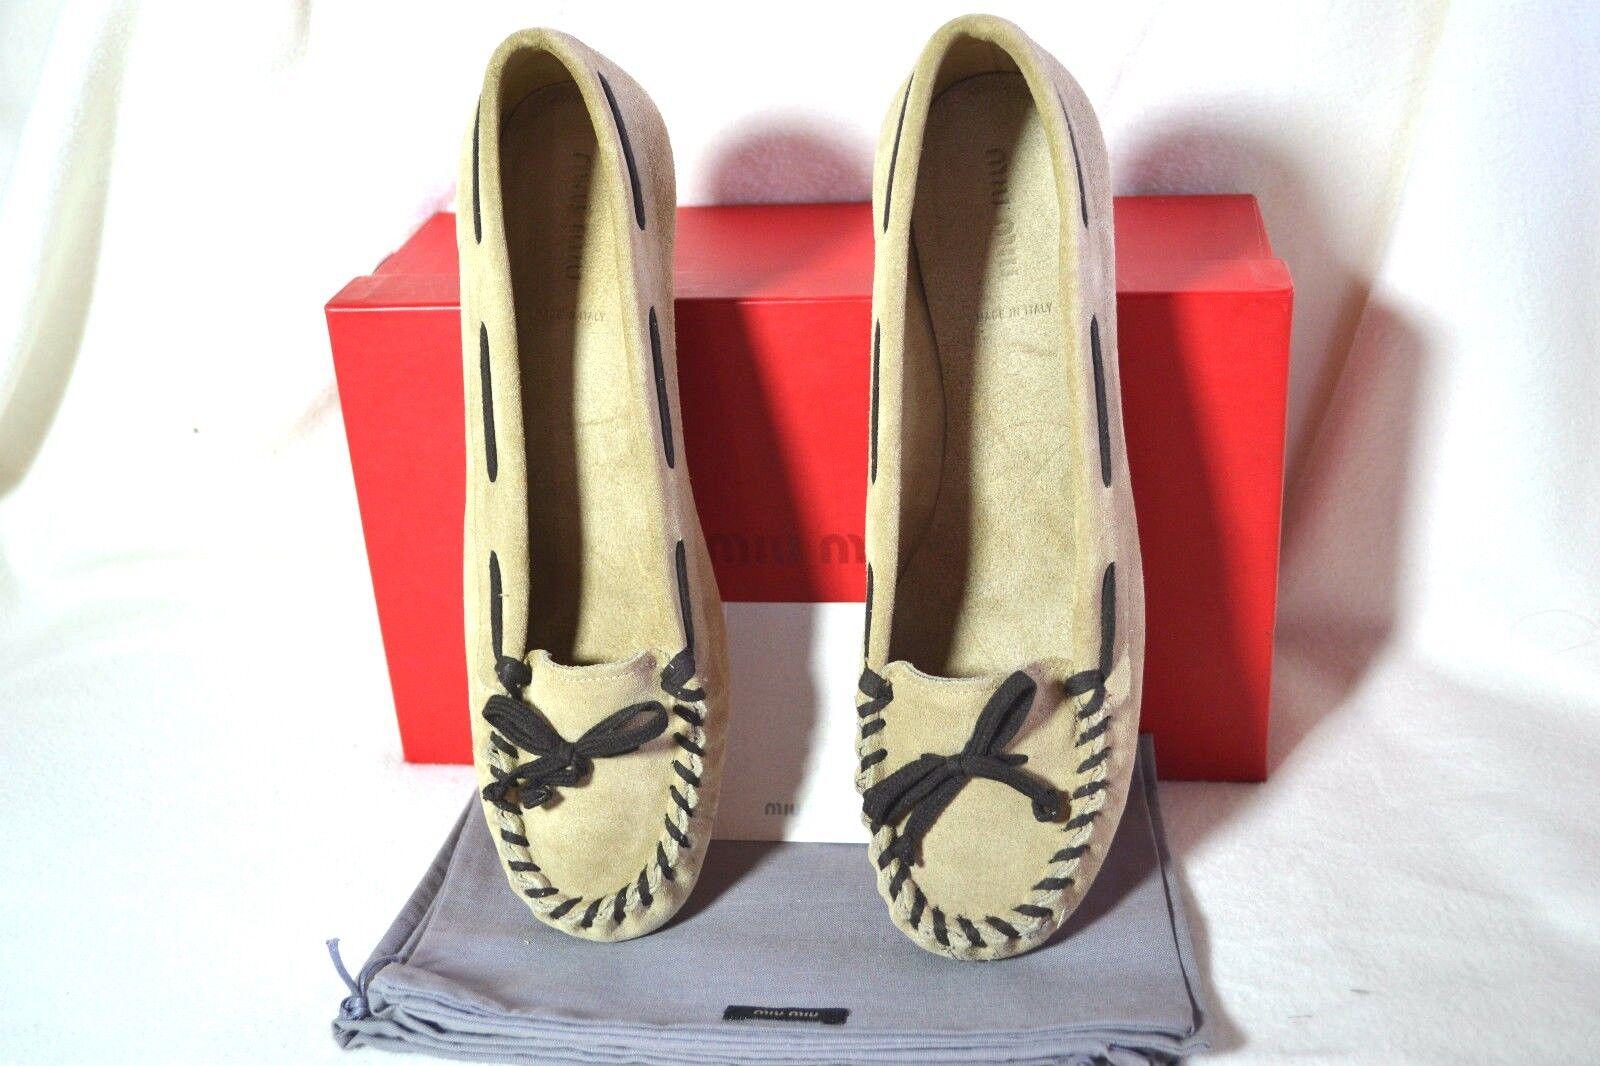 PRADA MIU MIU Schuhe Schuhe Pumps UK Heels Mokassin Leder 35,5 UK Pumps 2,5 NEU NEW 314121